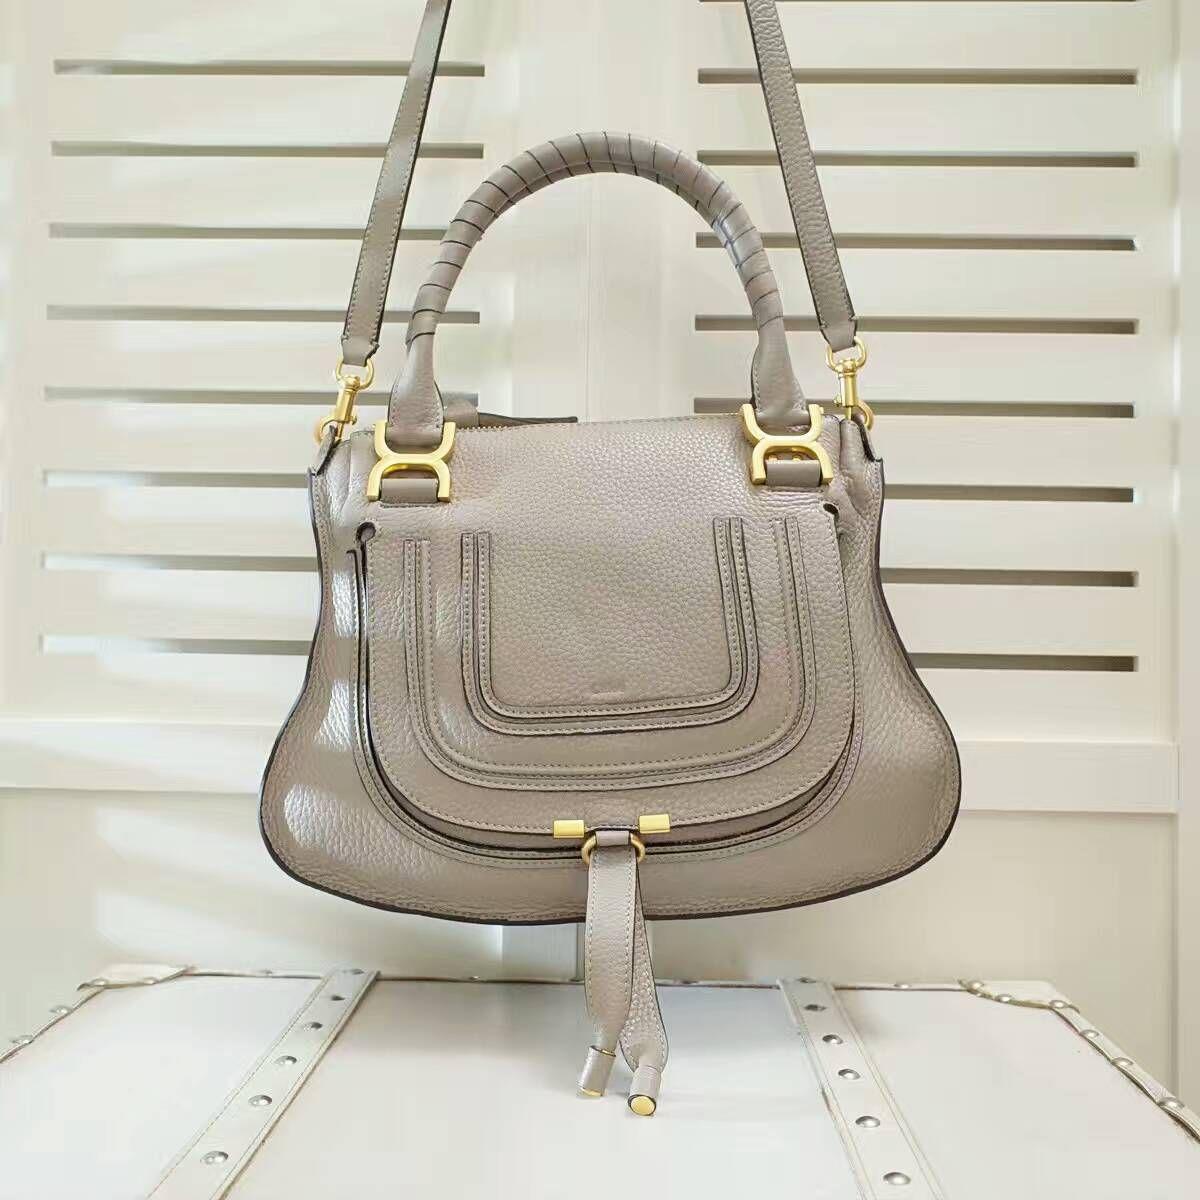 9d8b9118 Chloe Marcie handbag small grain calfskin size:38x26x12cm C8 ...